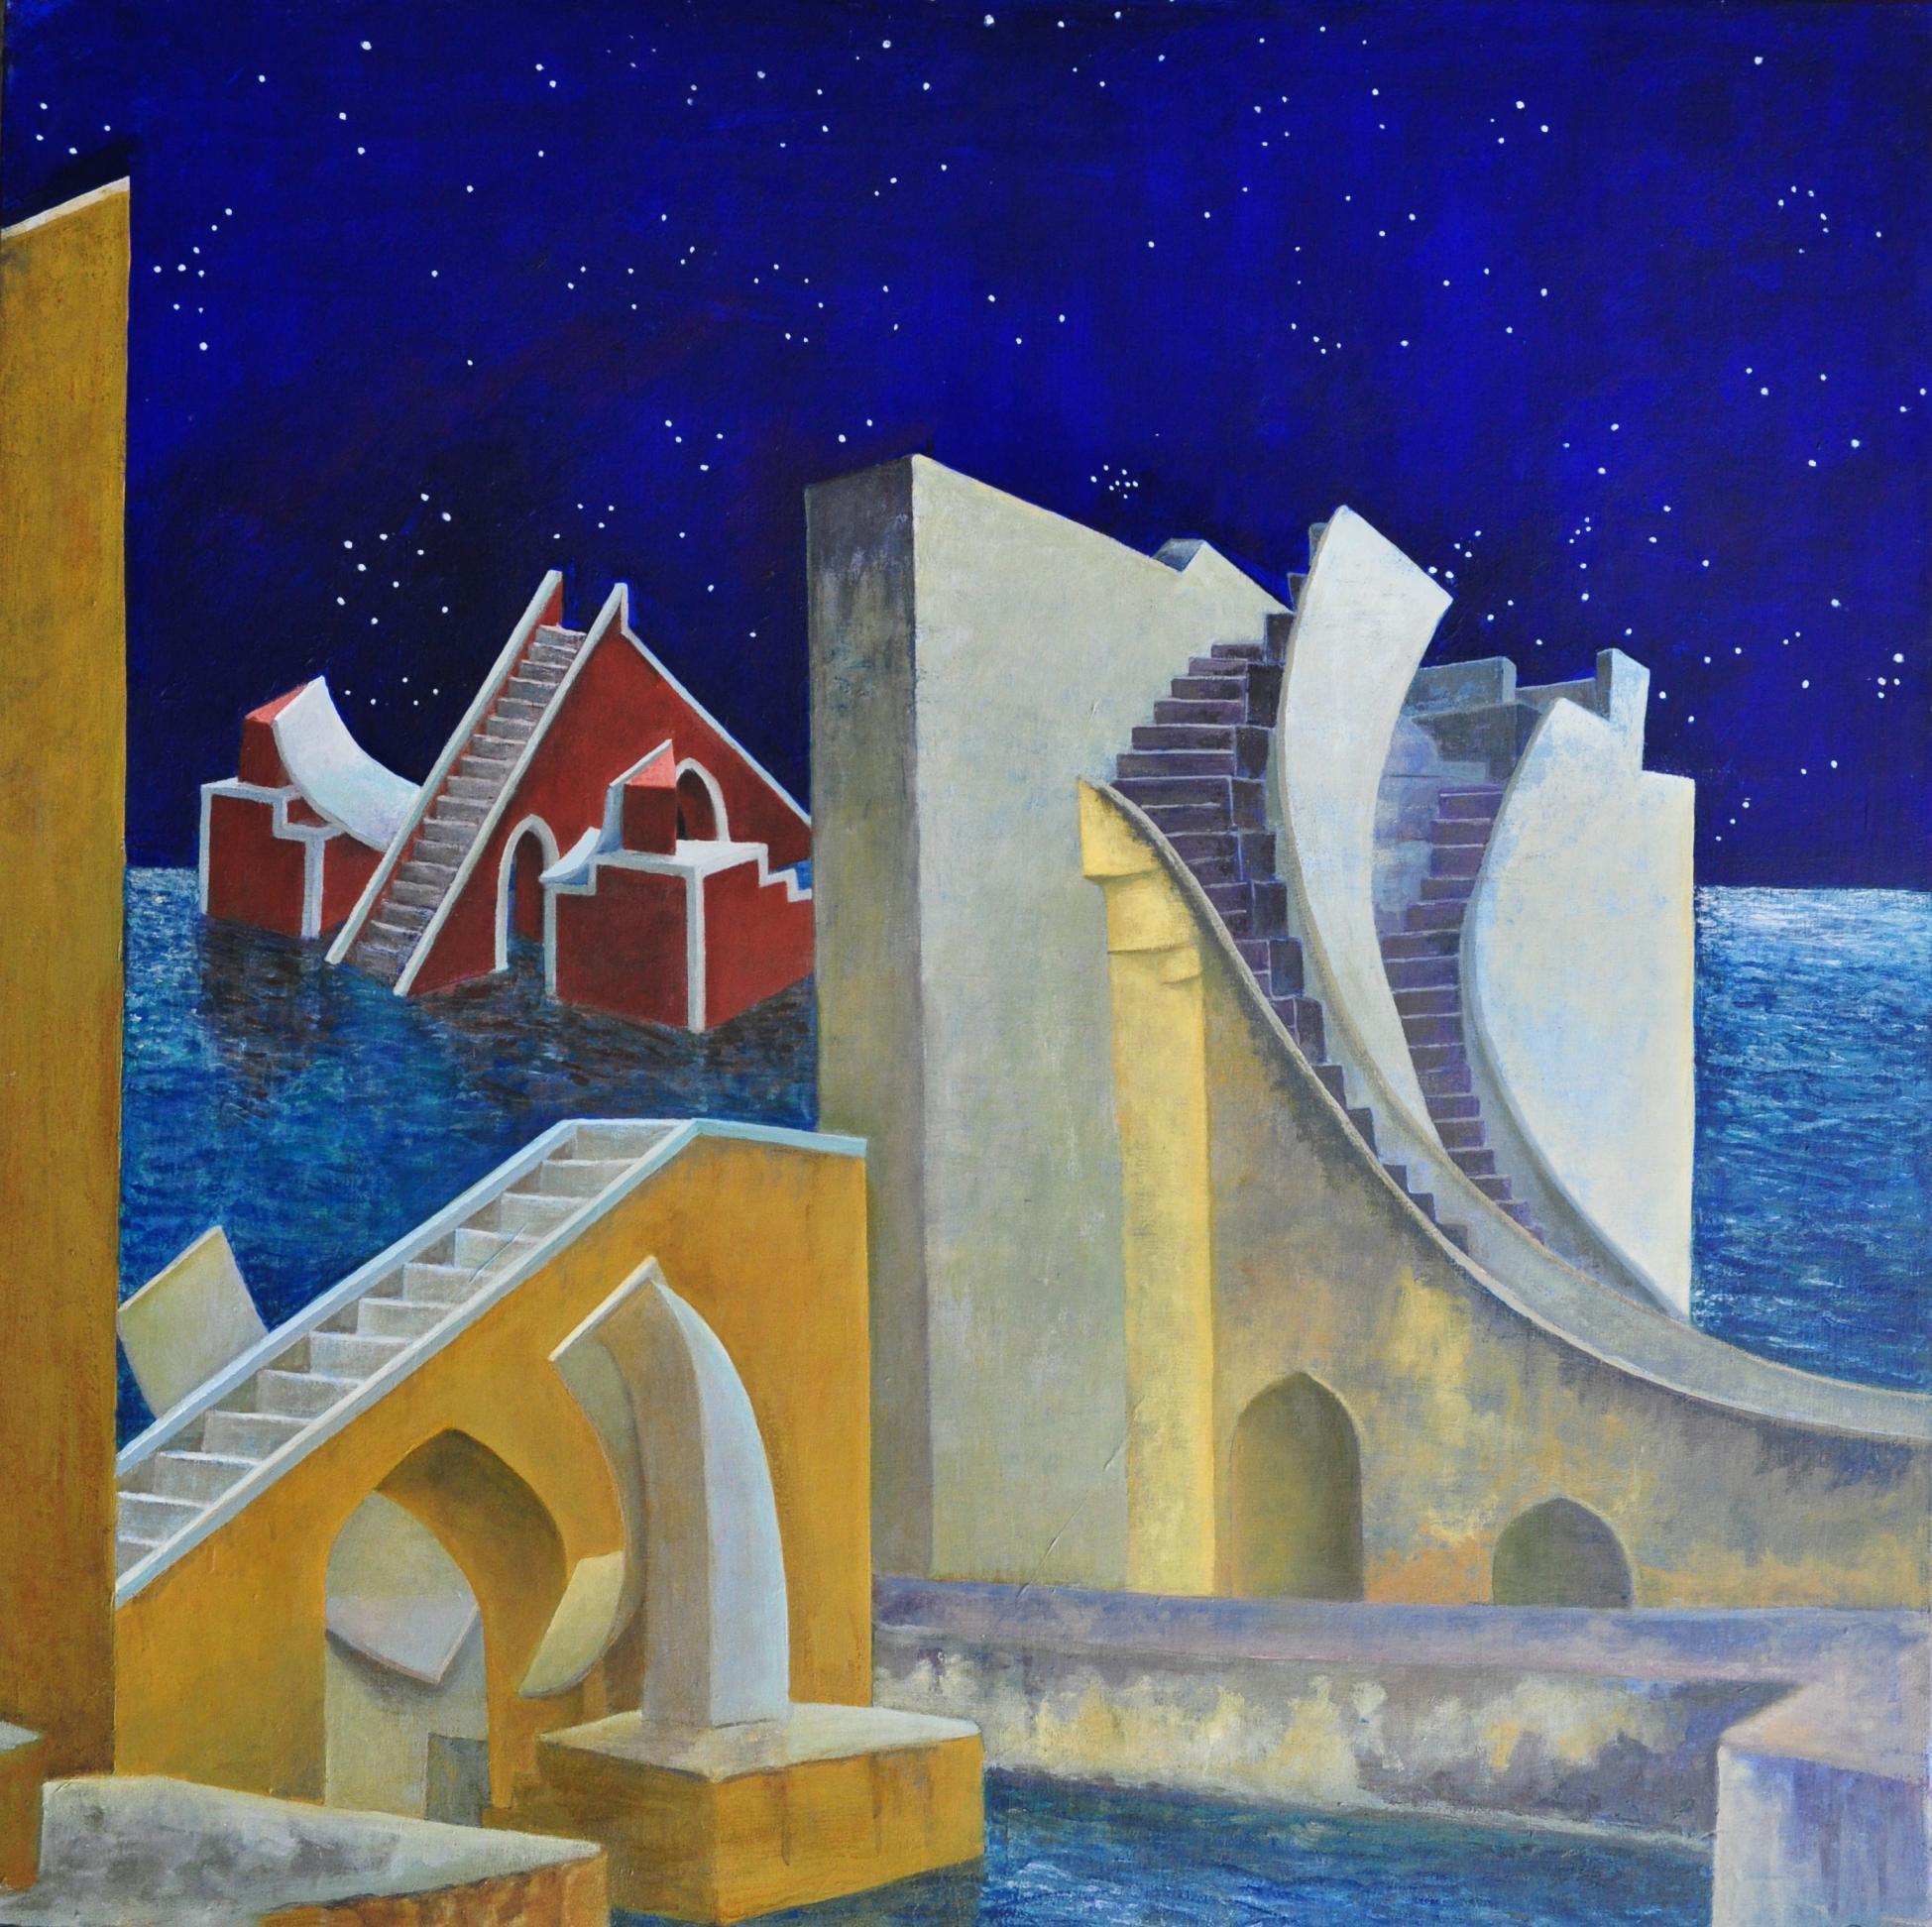 Observatorio (2004) - Carmen Pagés Valcarlos